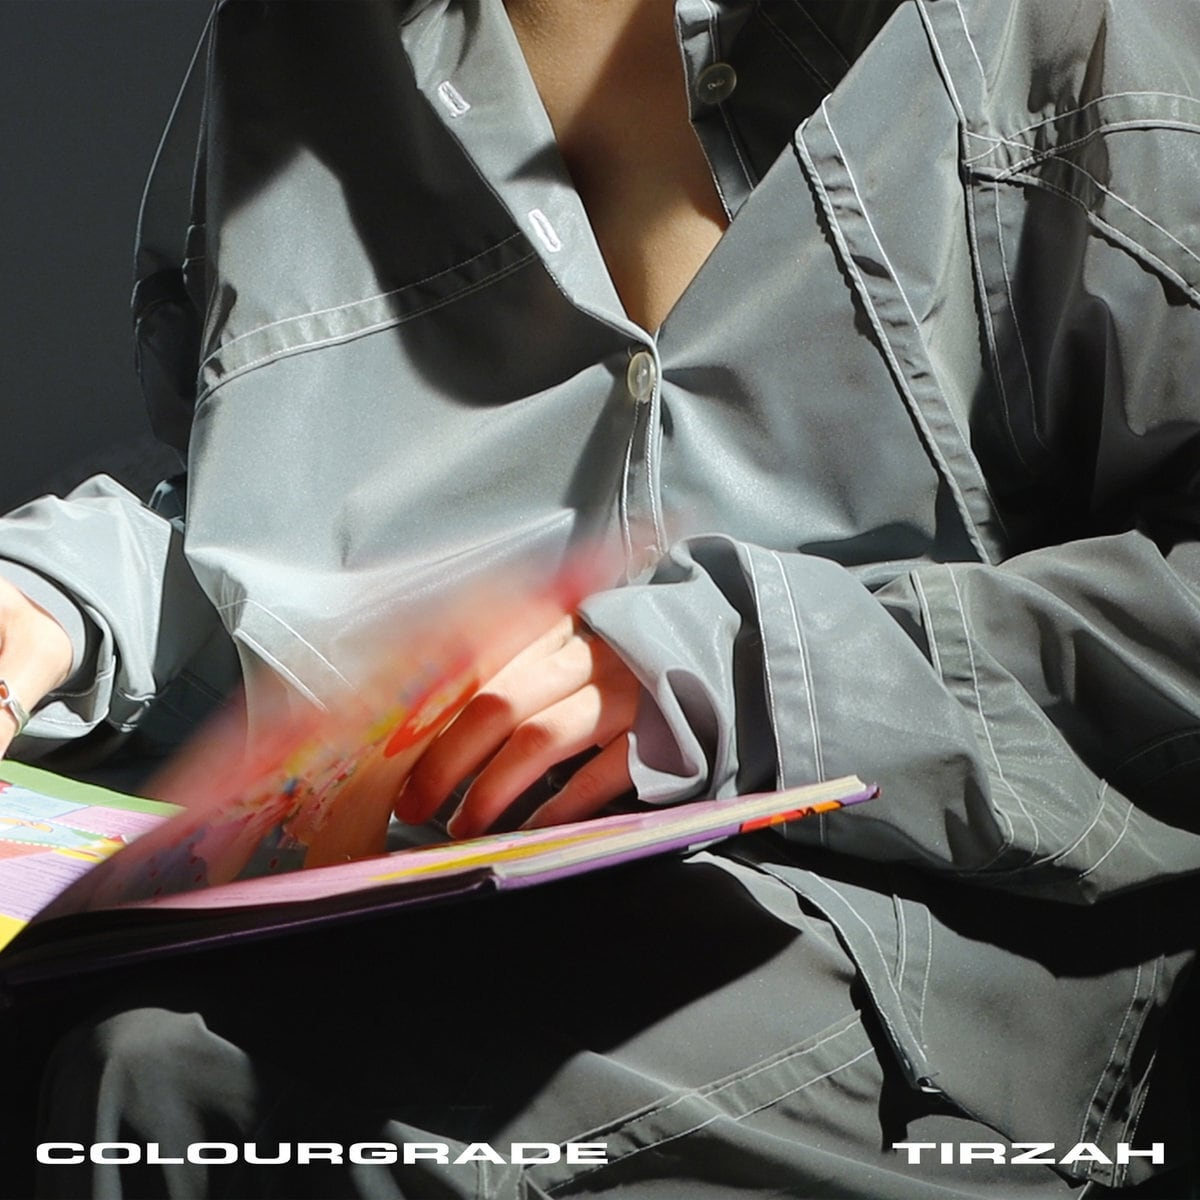 Tirzah - Colourgrade (LTD. Transparent Sun LP)